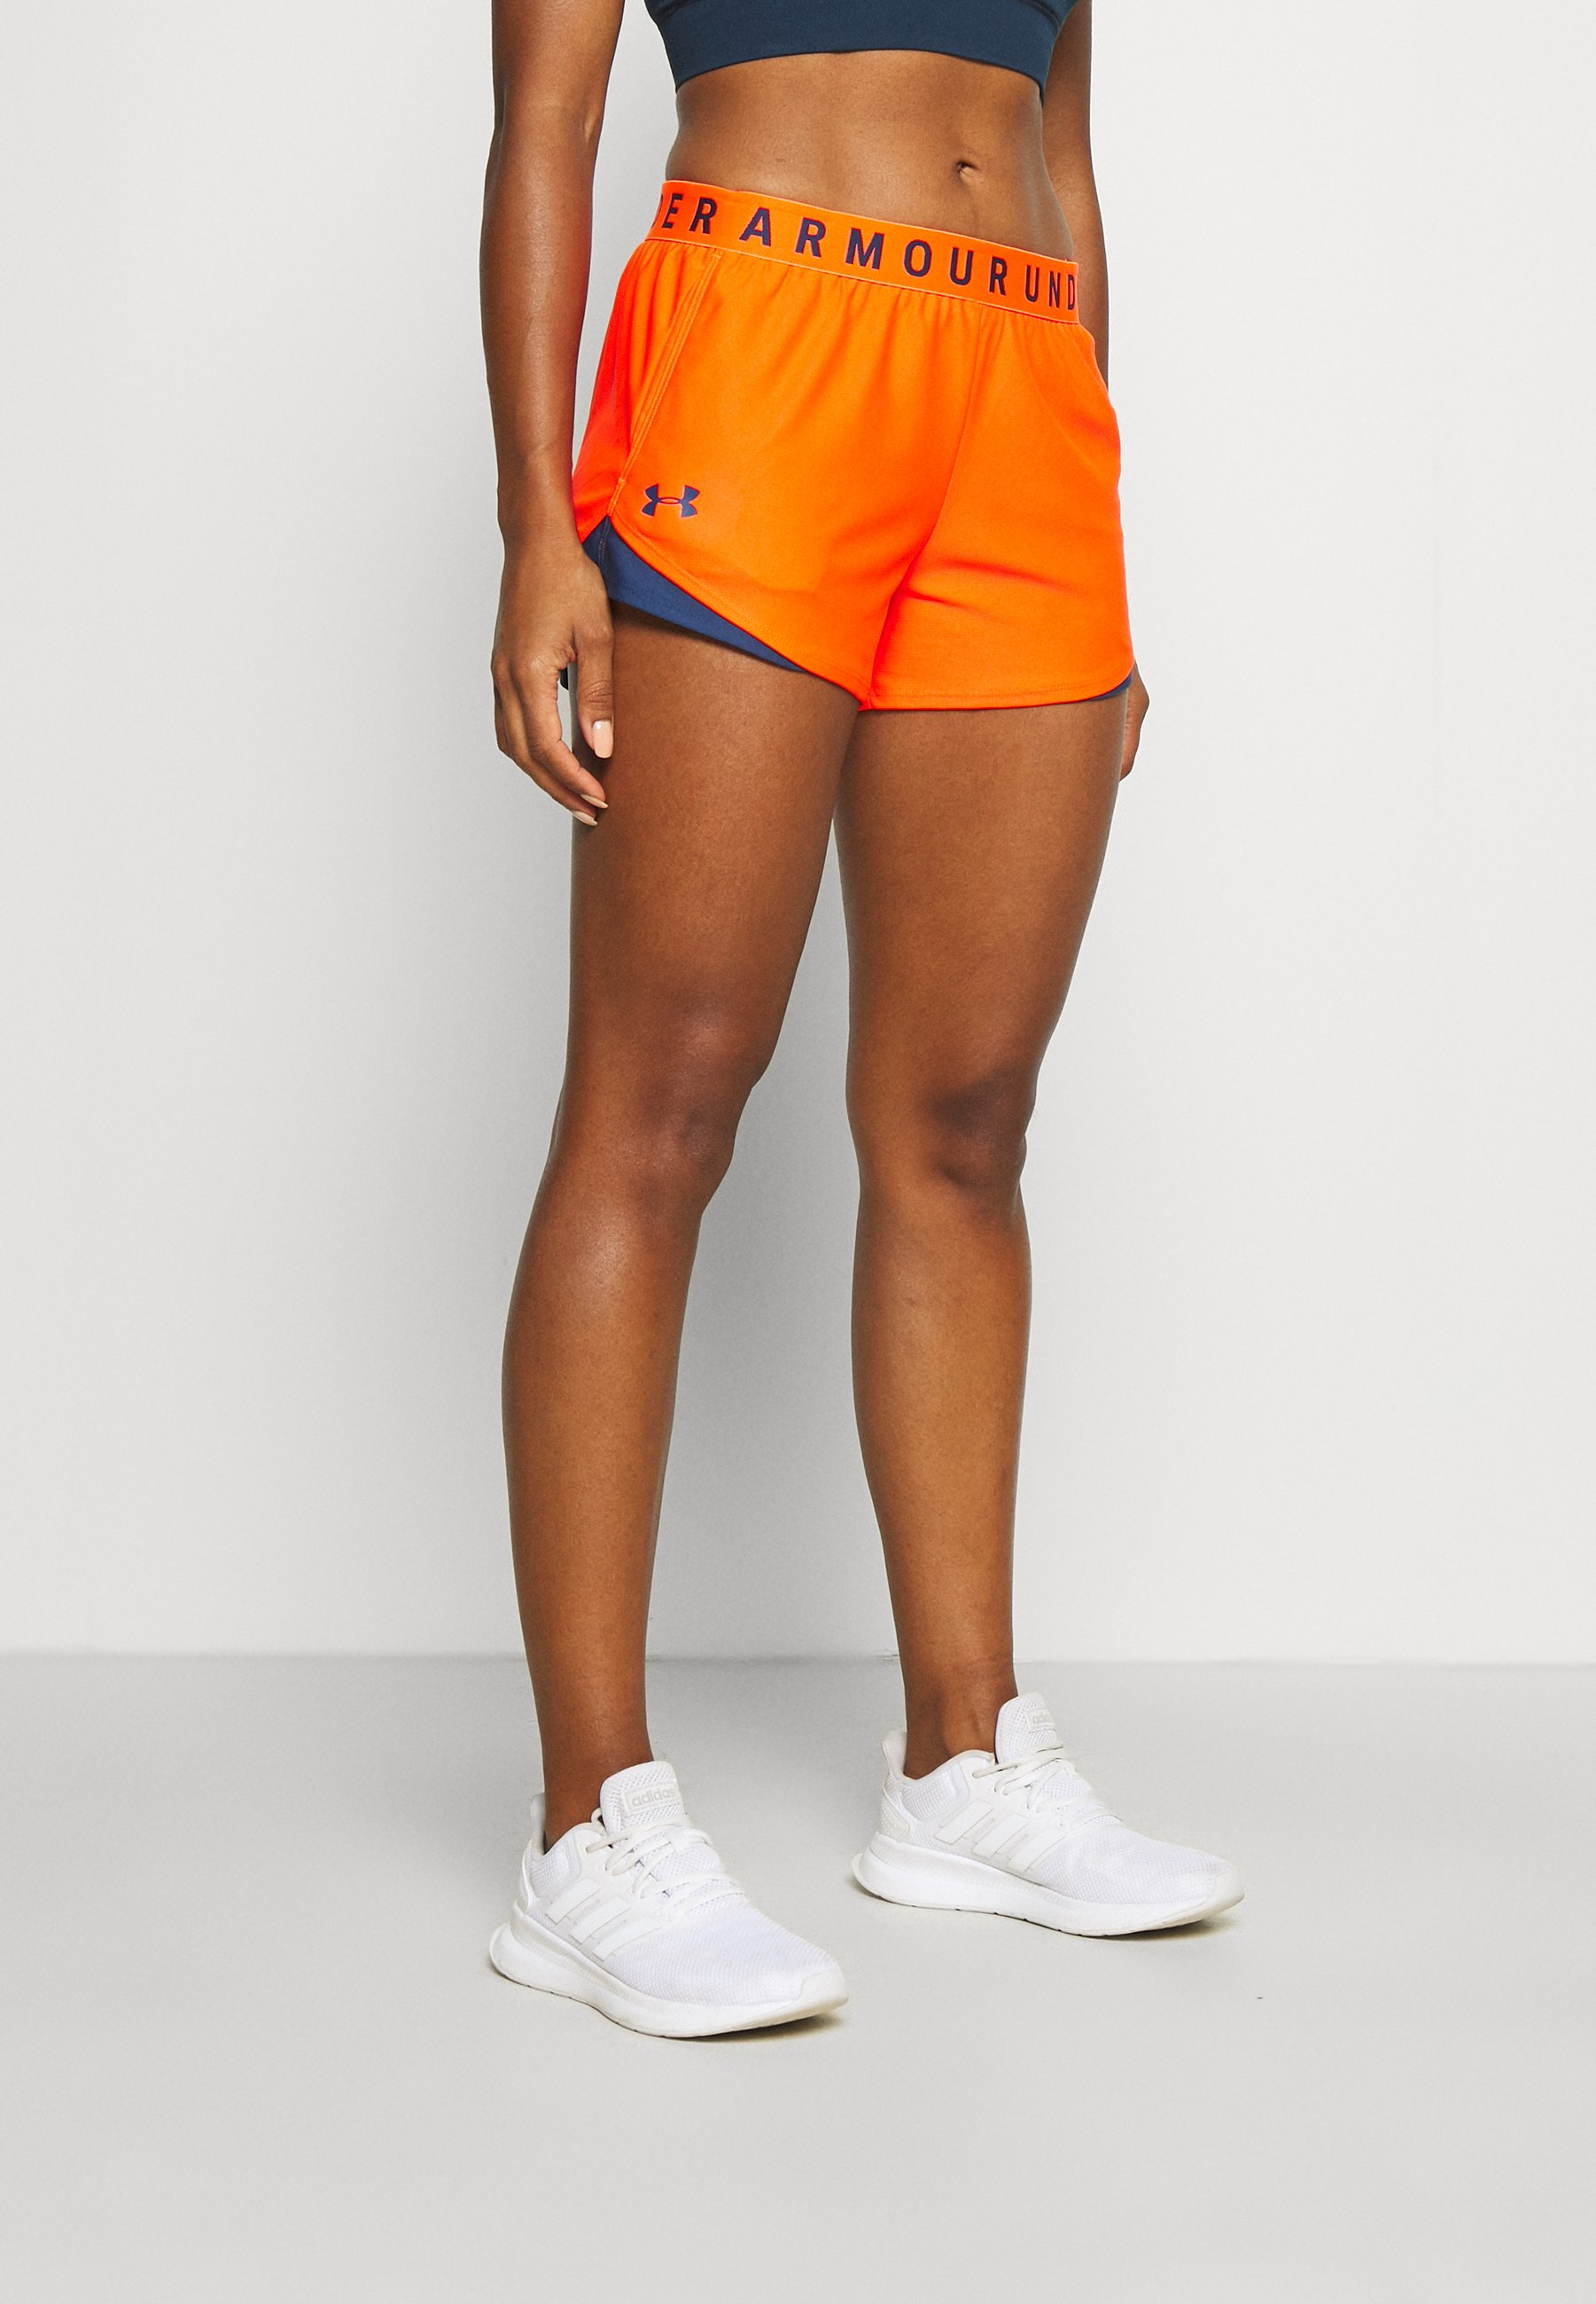 Damen PLAY UP SHORTS 3.0 - kurze Sporthose